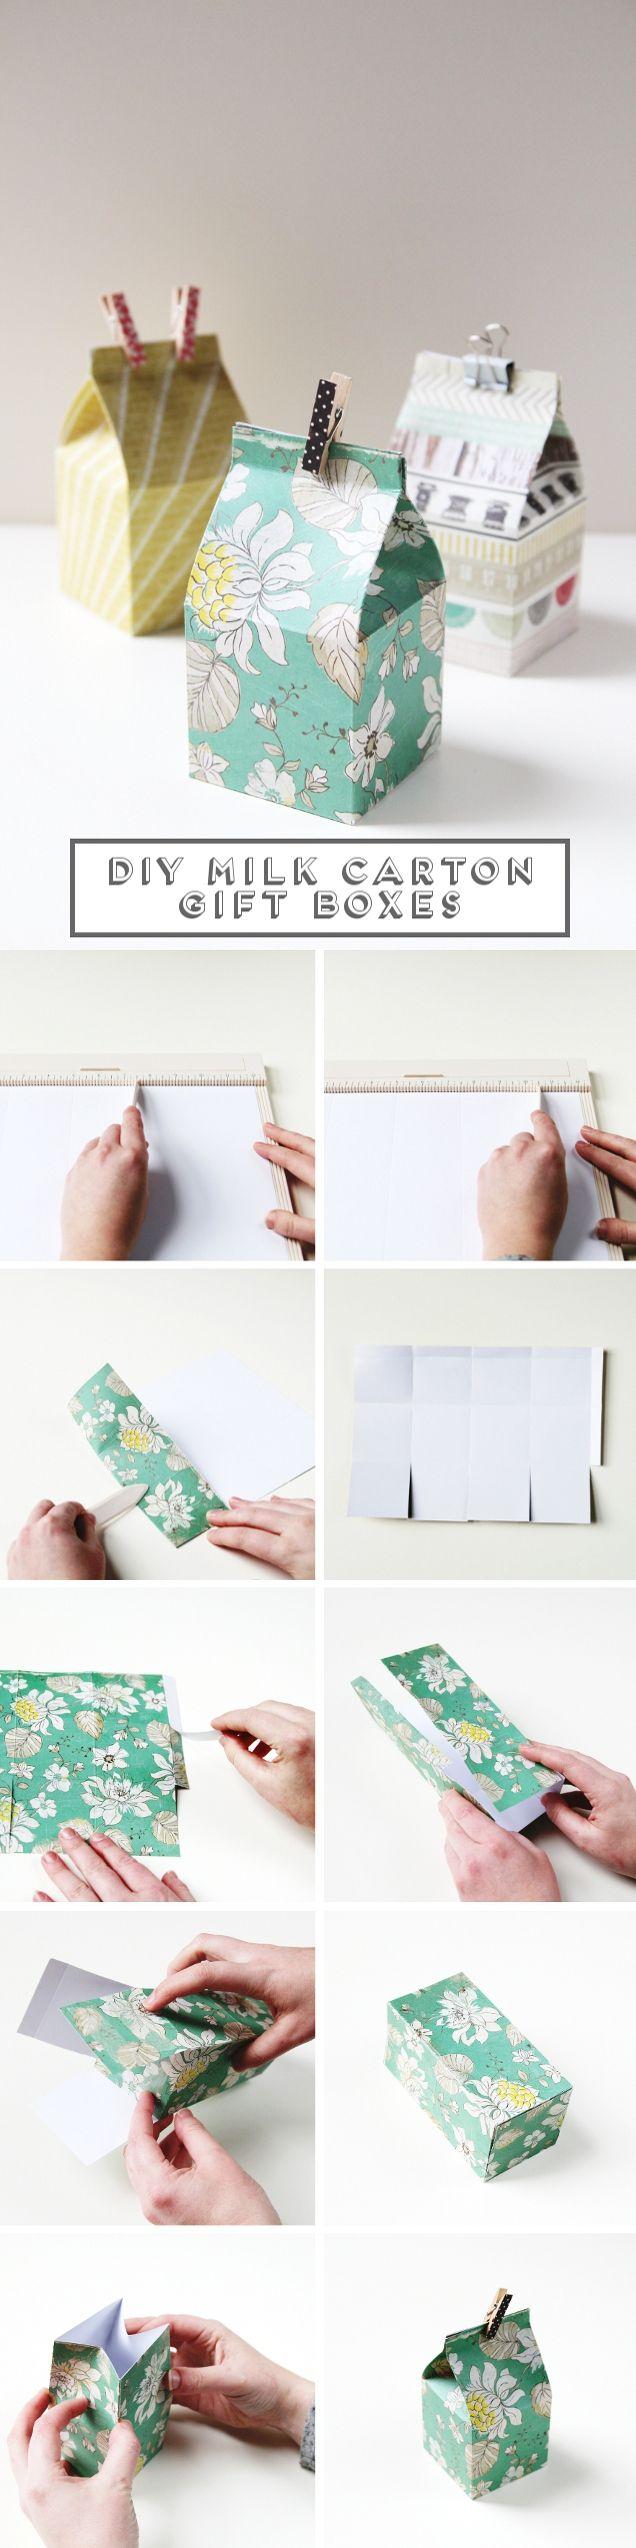 how to make paper big box